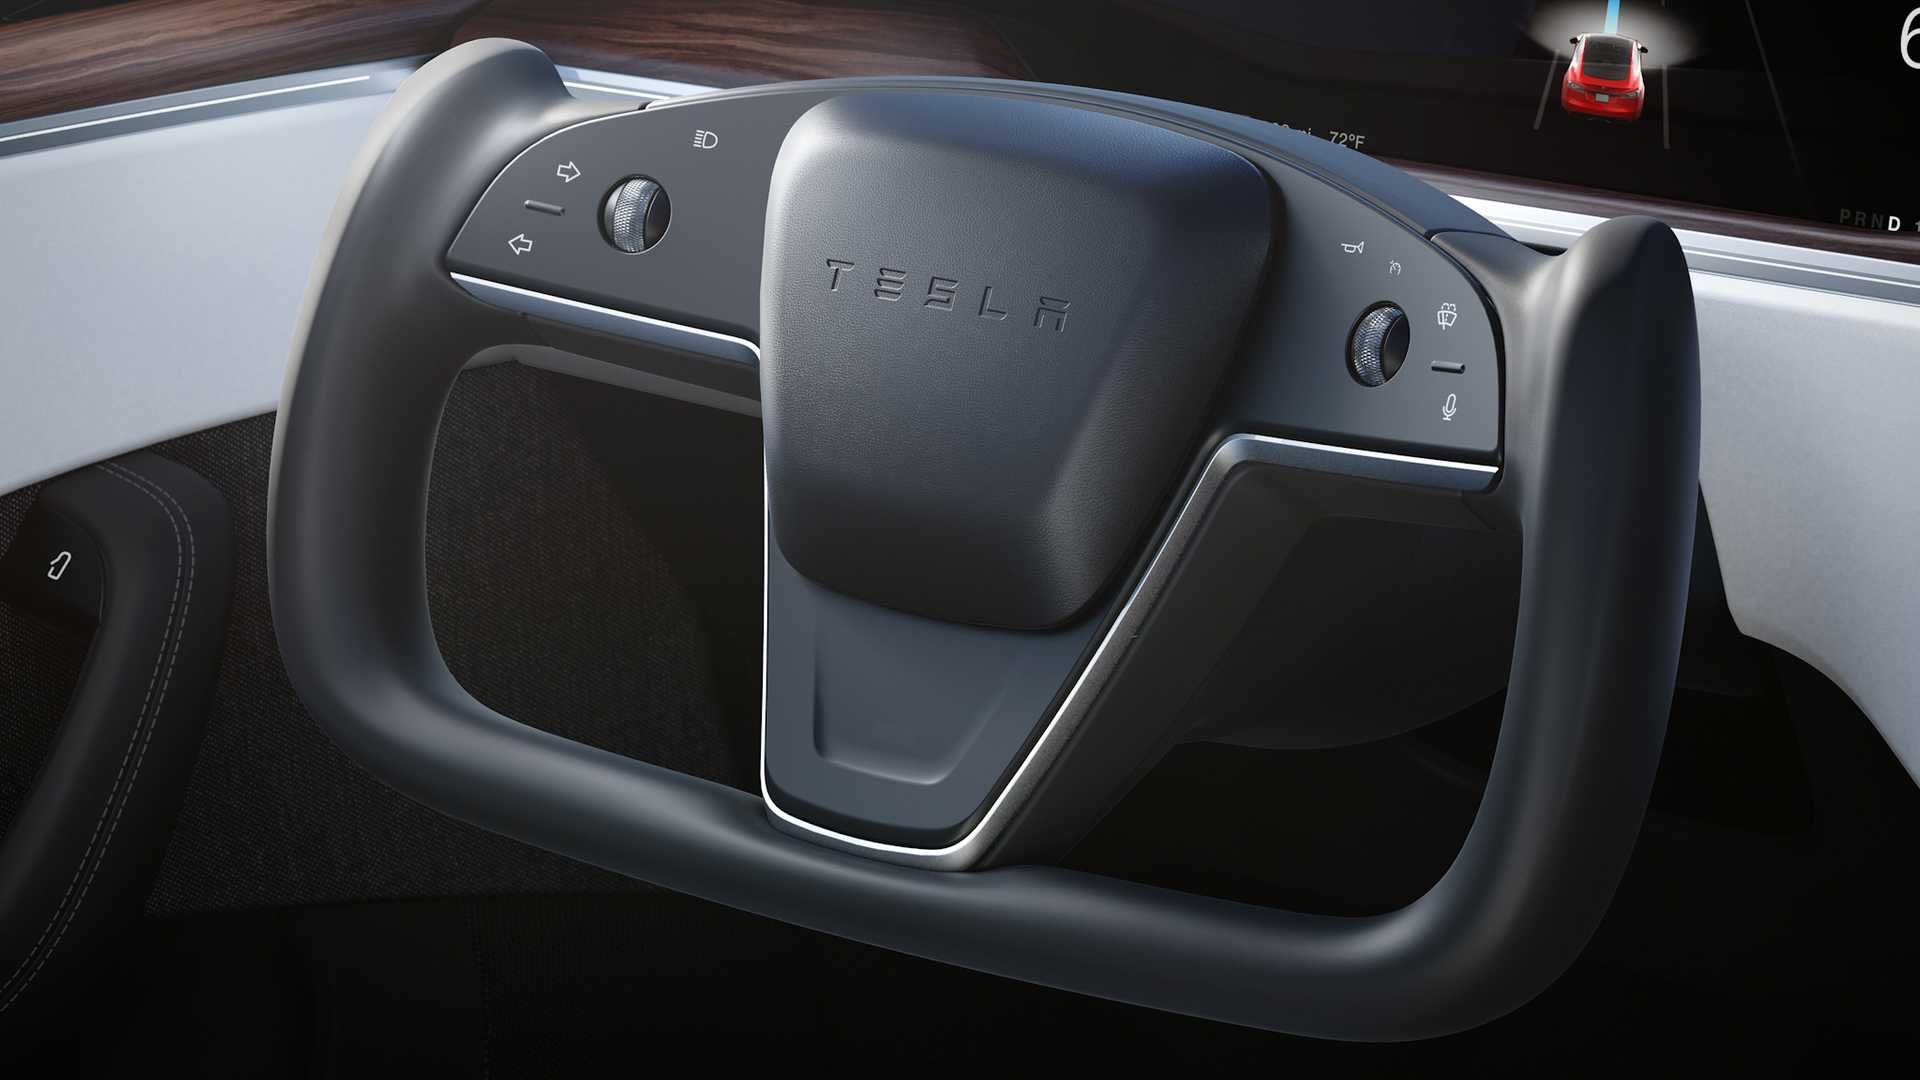 Tesla steering yoke evaluation raises safety concerns - report